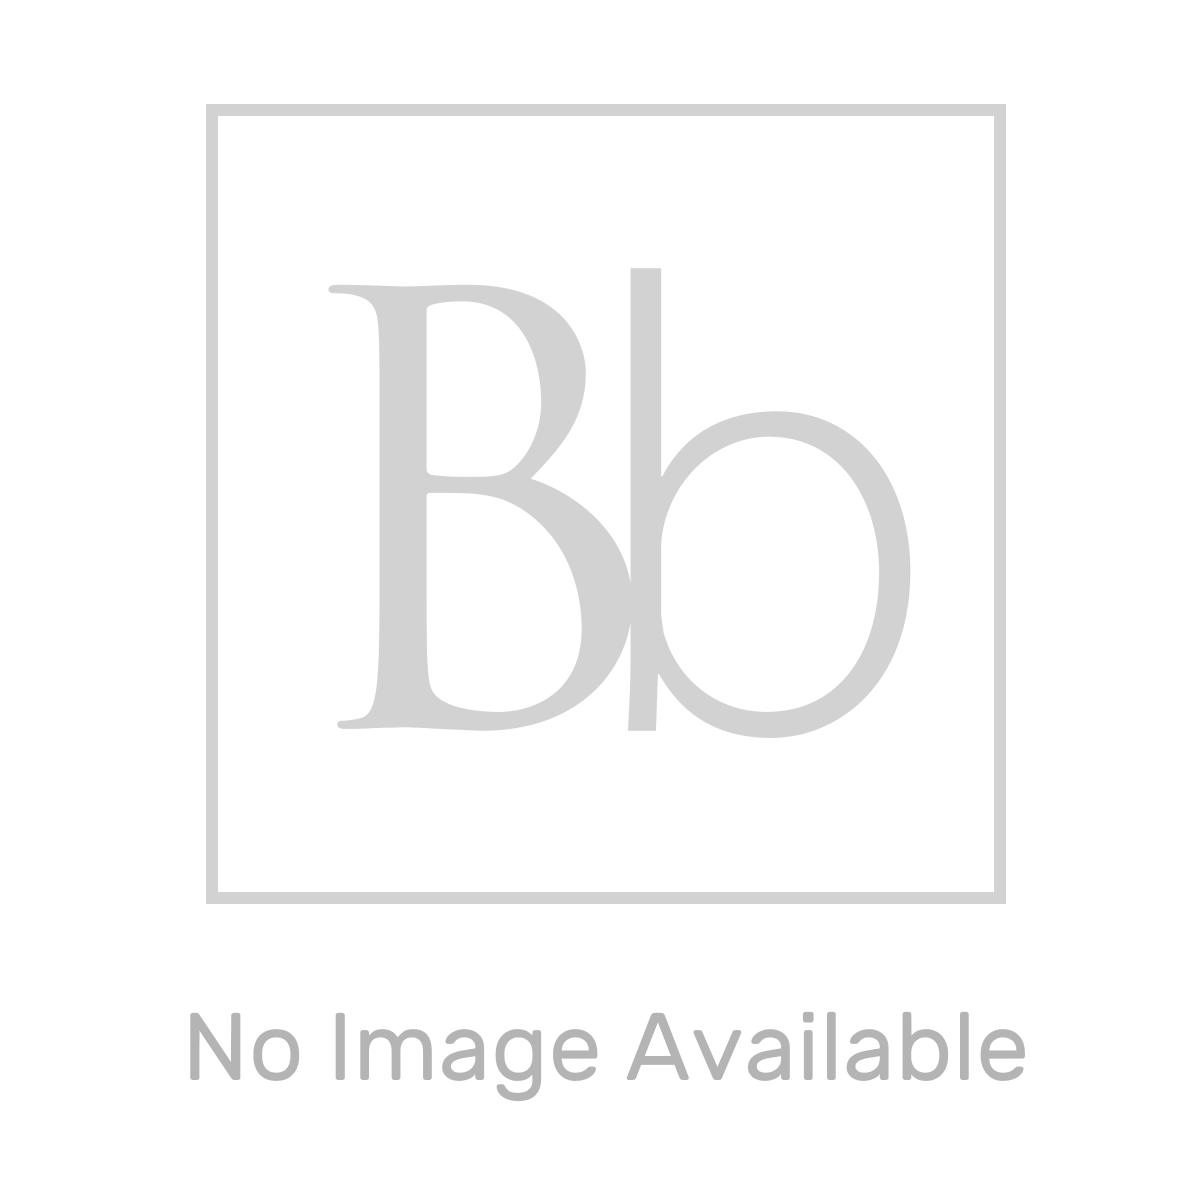 Sensio Ainsley Single Door LED Cabinet Mirror 700 x 564 x 126 3